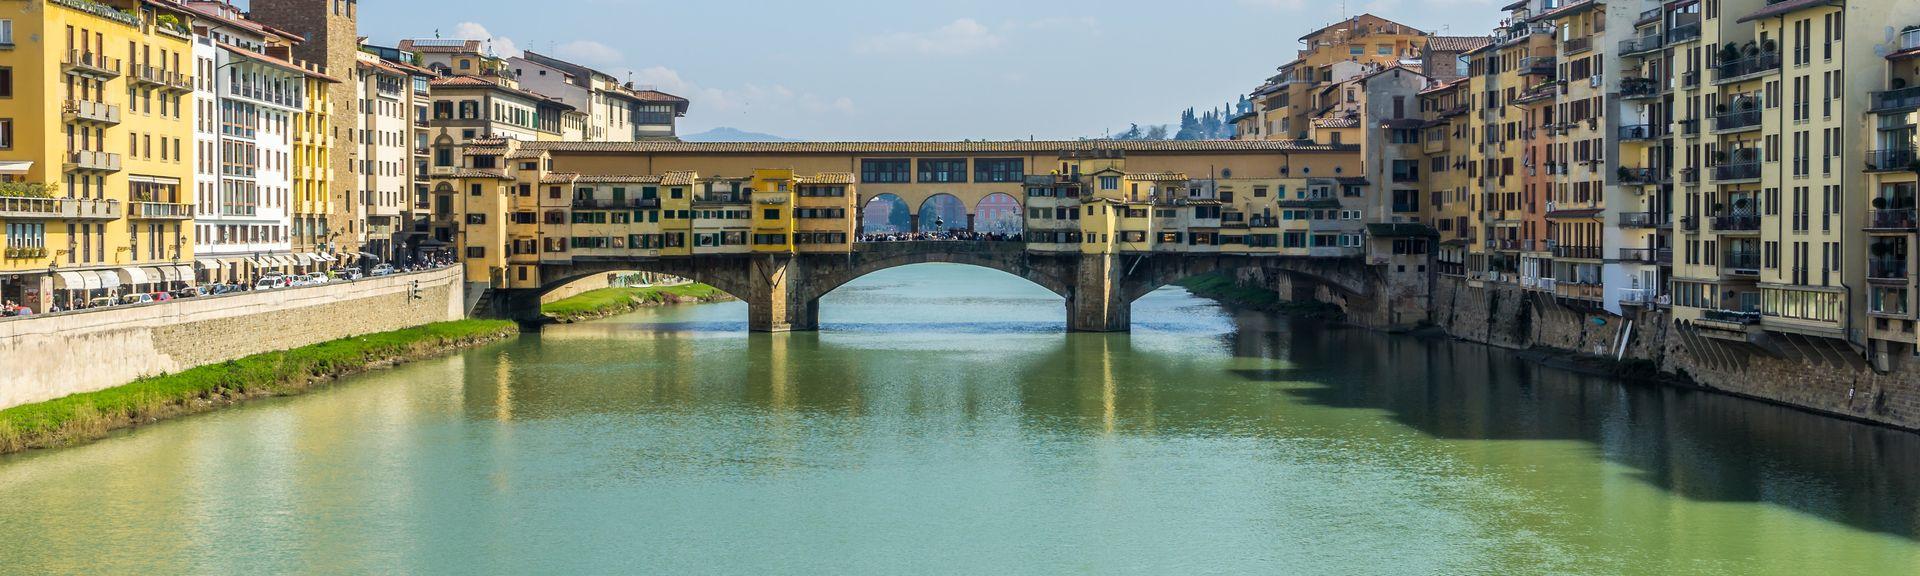 Isolotto, Firenze, Toscana, Italia